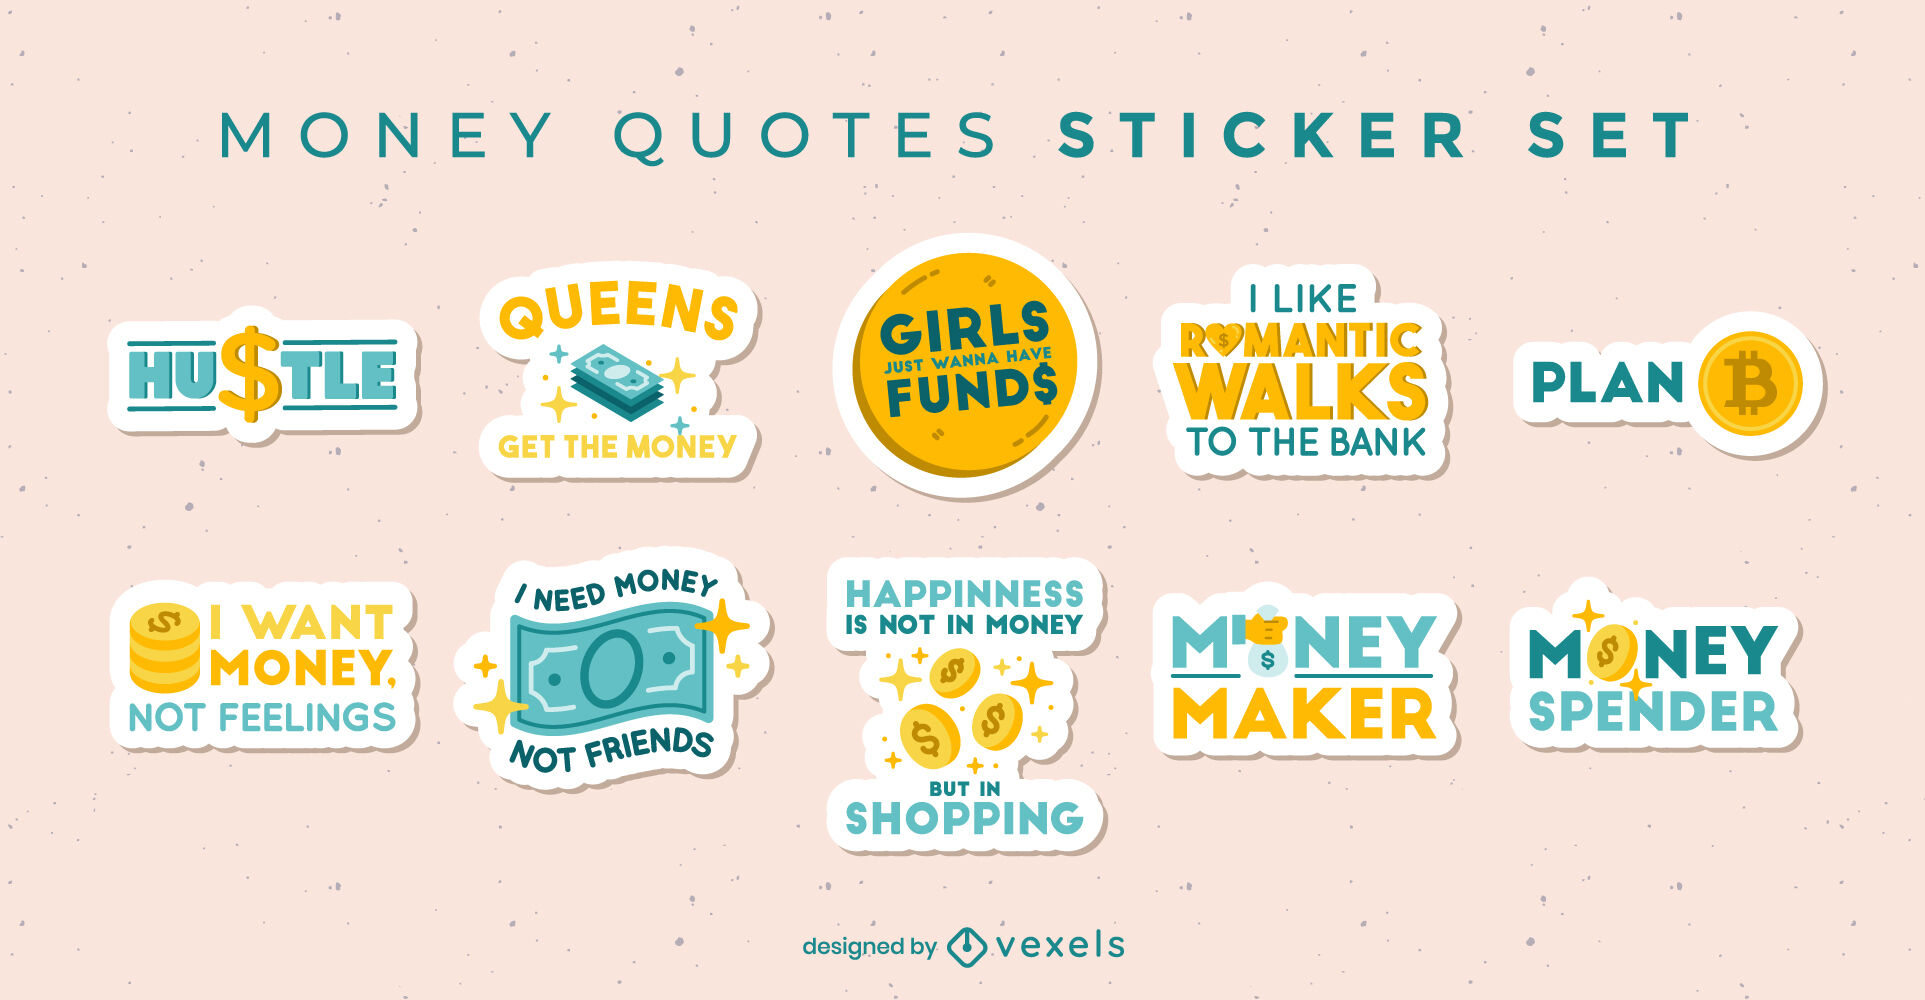 Money quotes sticker elements set